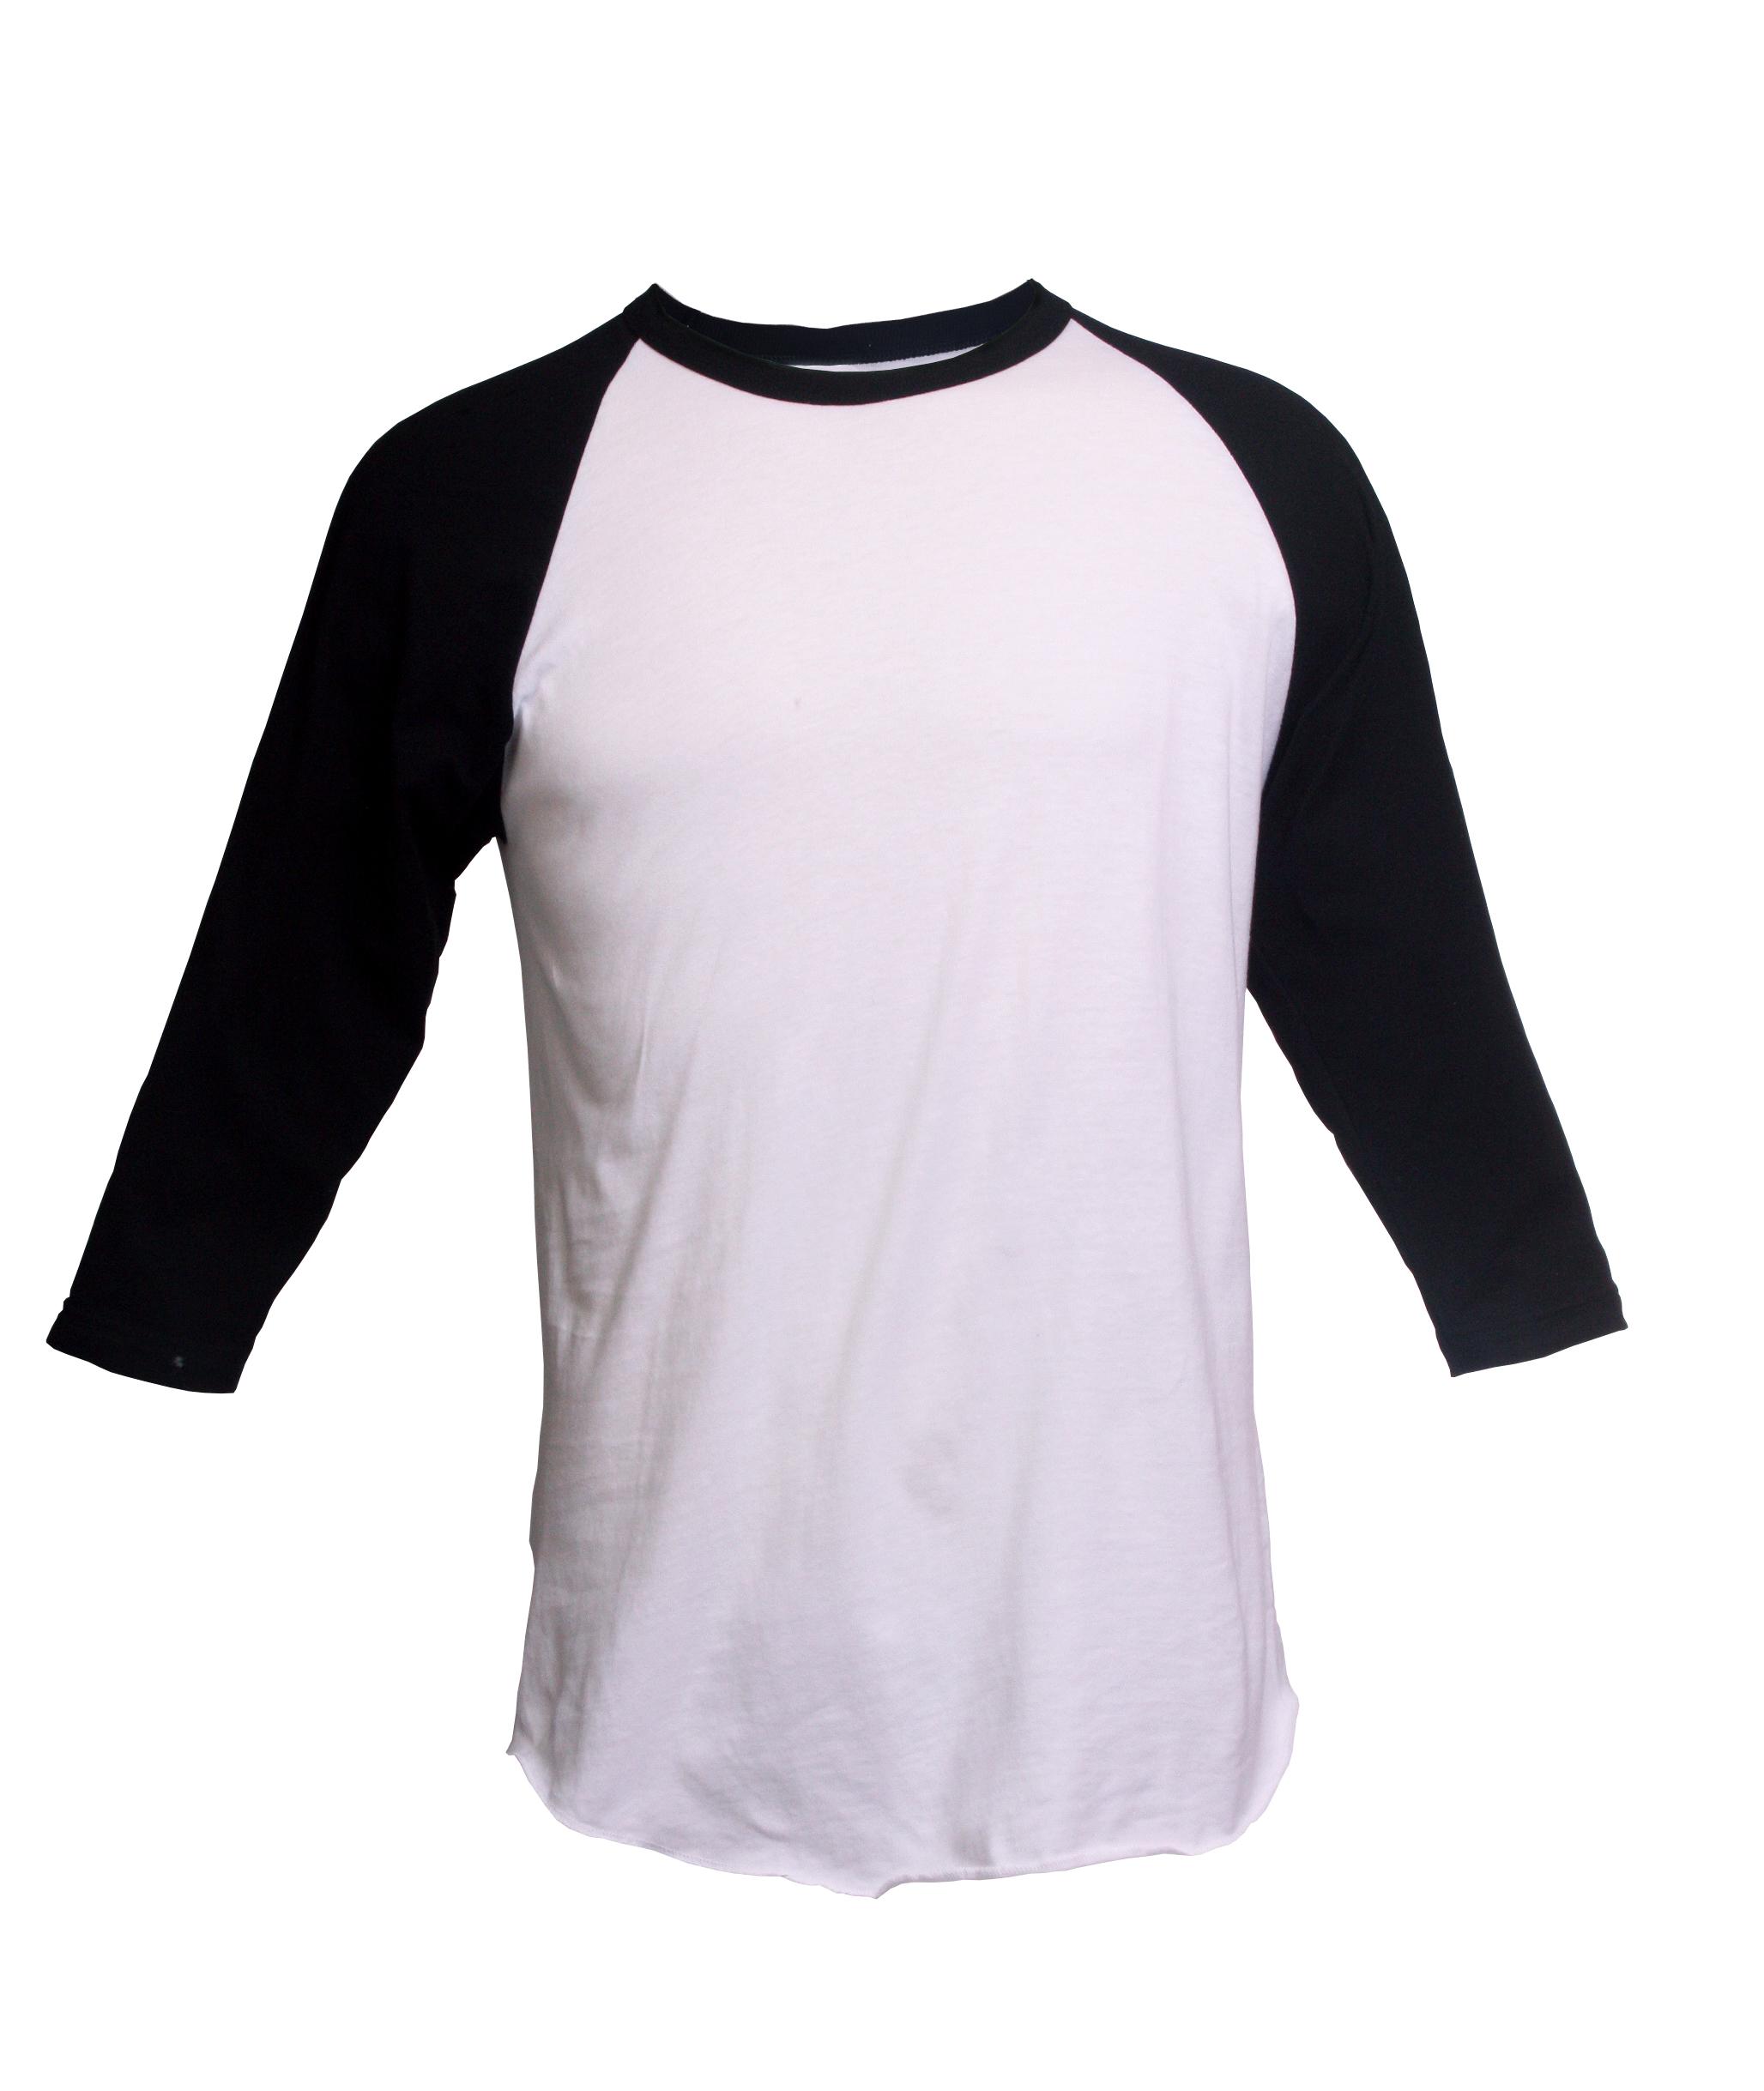 Women S Long Sleeve Tee Shirts